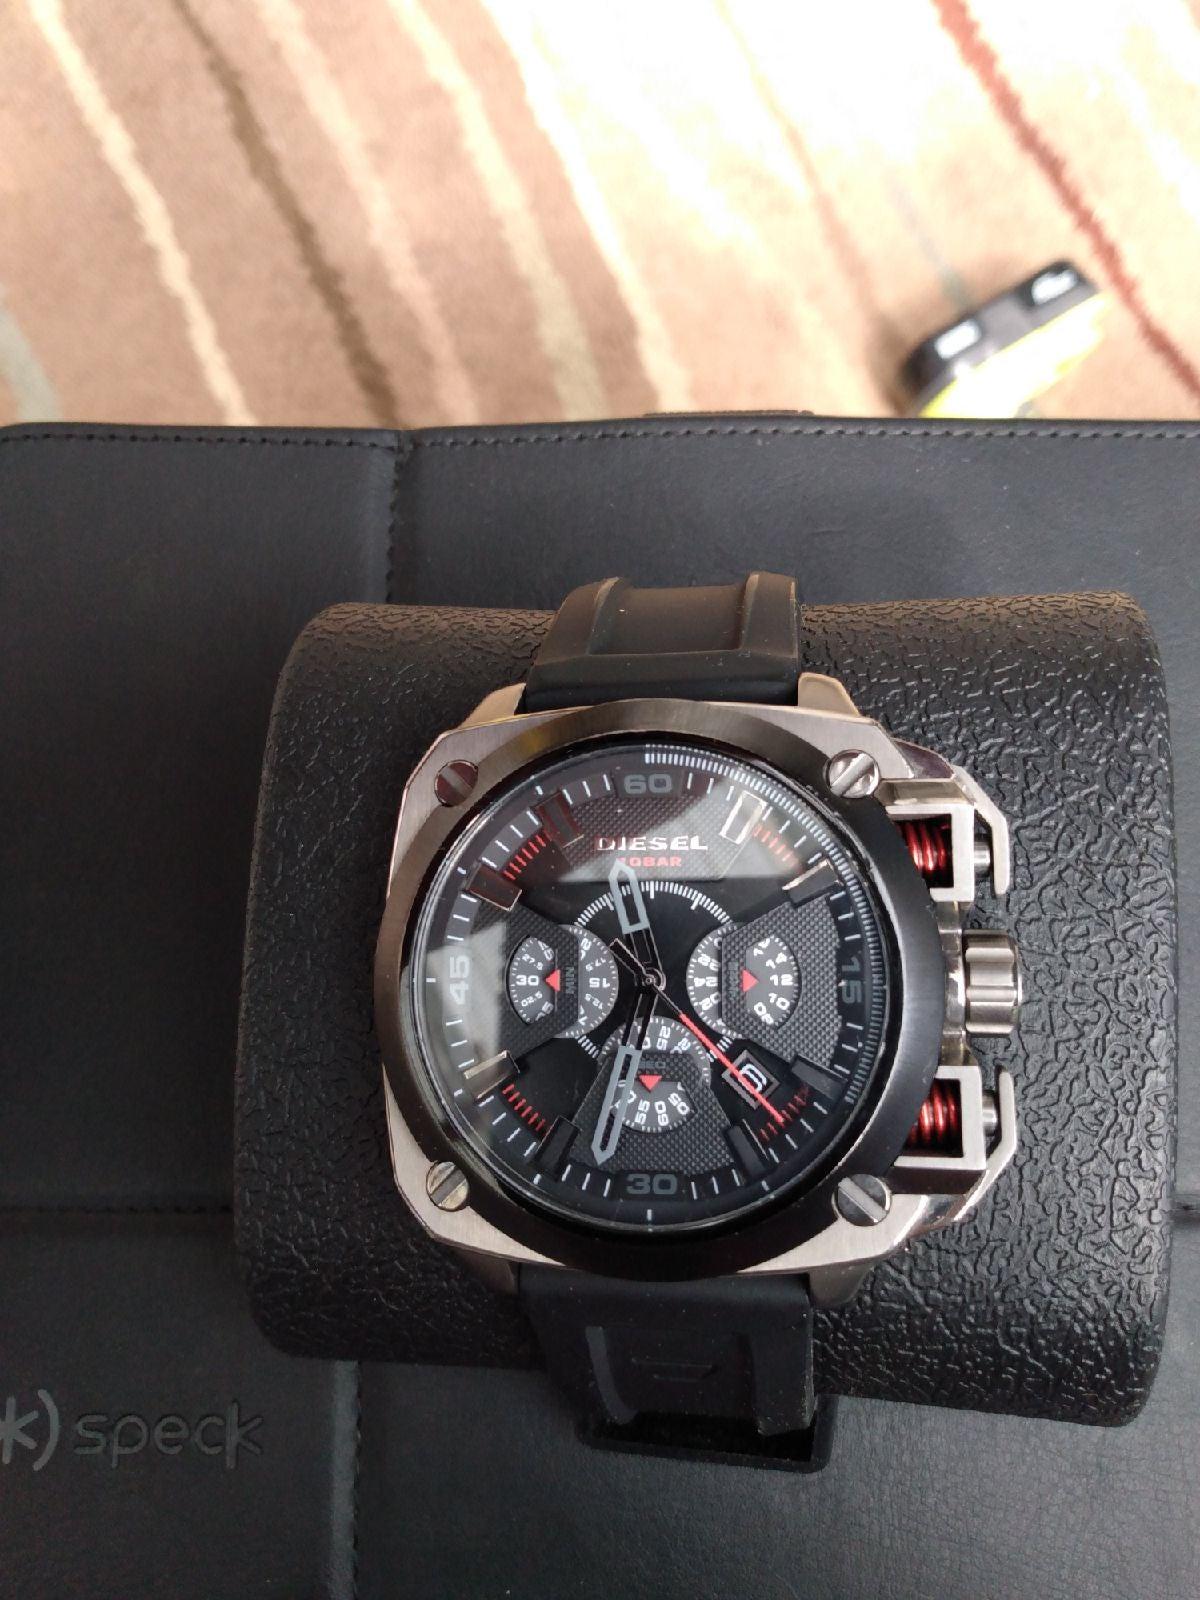 diesel watch 10 Bar military grade